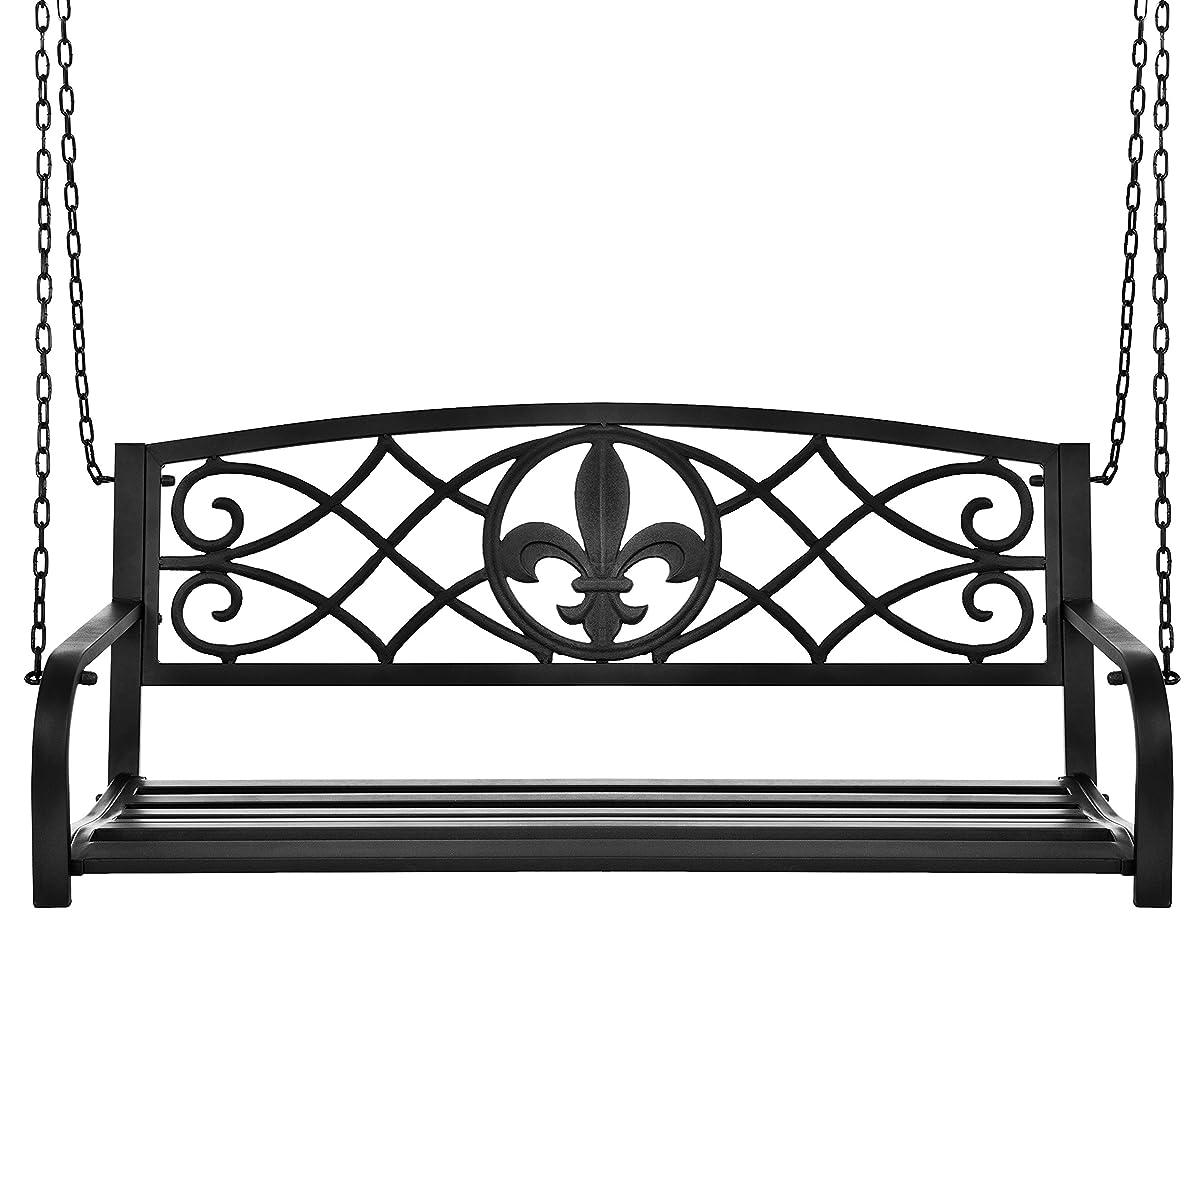 Best Choice Products Outdoor Furniture Metal Fleur-De-Lis Hanging Patio Porch Swing - Black